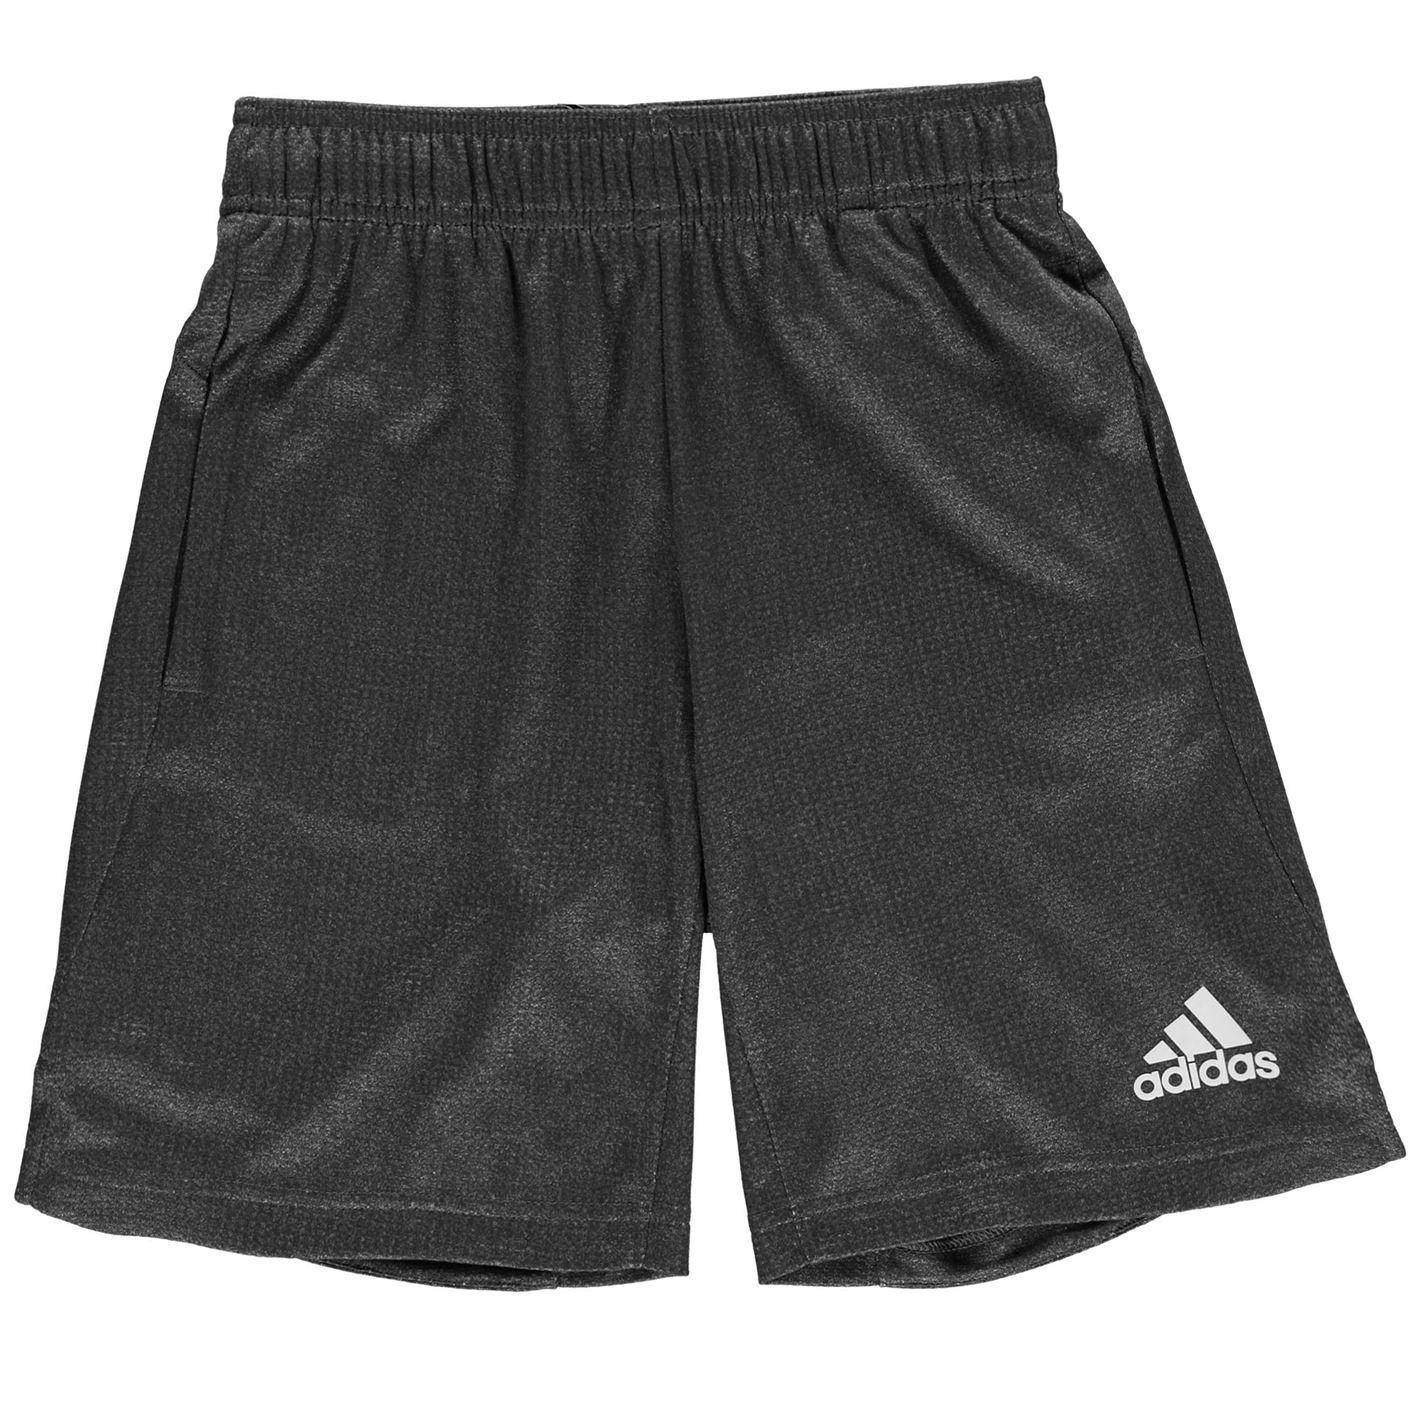 Adidas Climachill Training Shorts Junior Boys